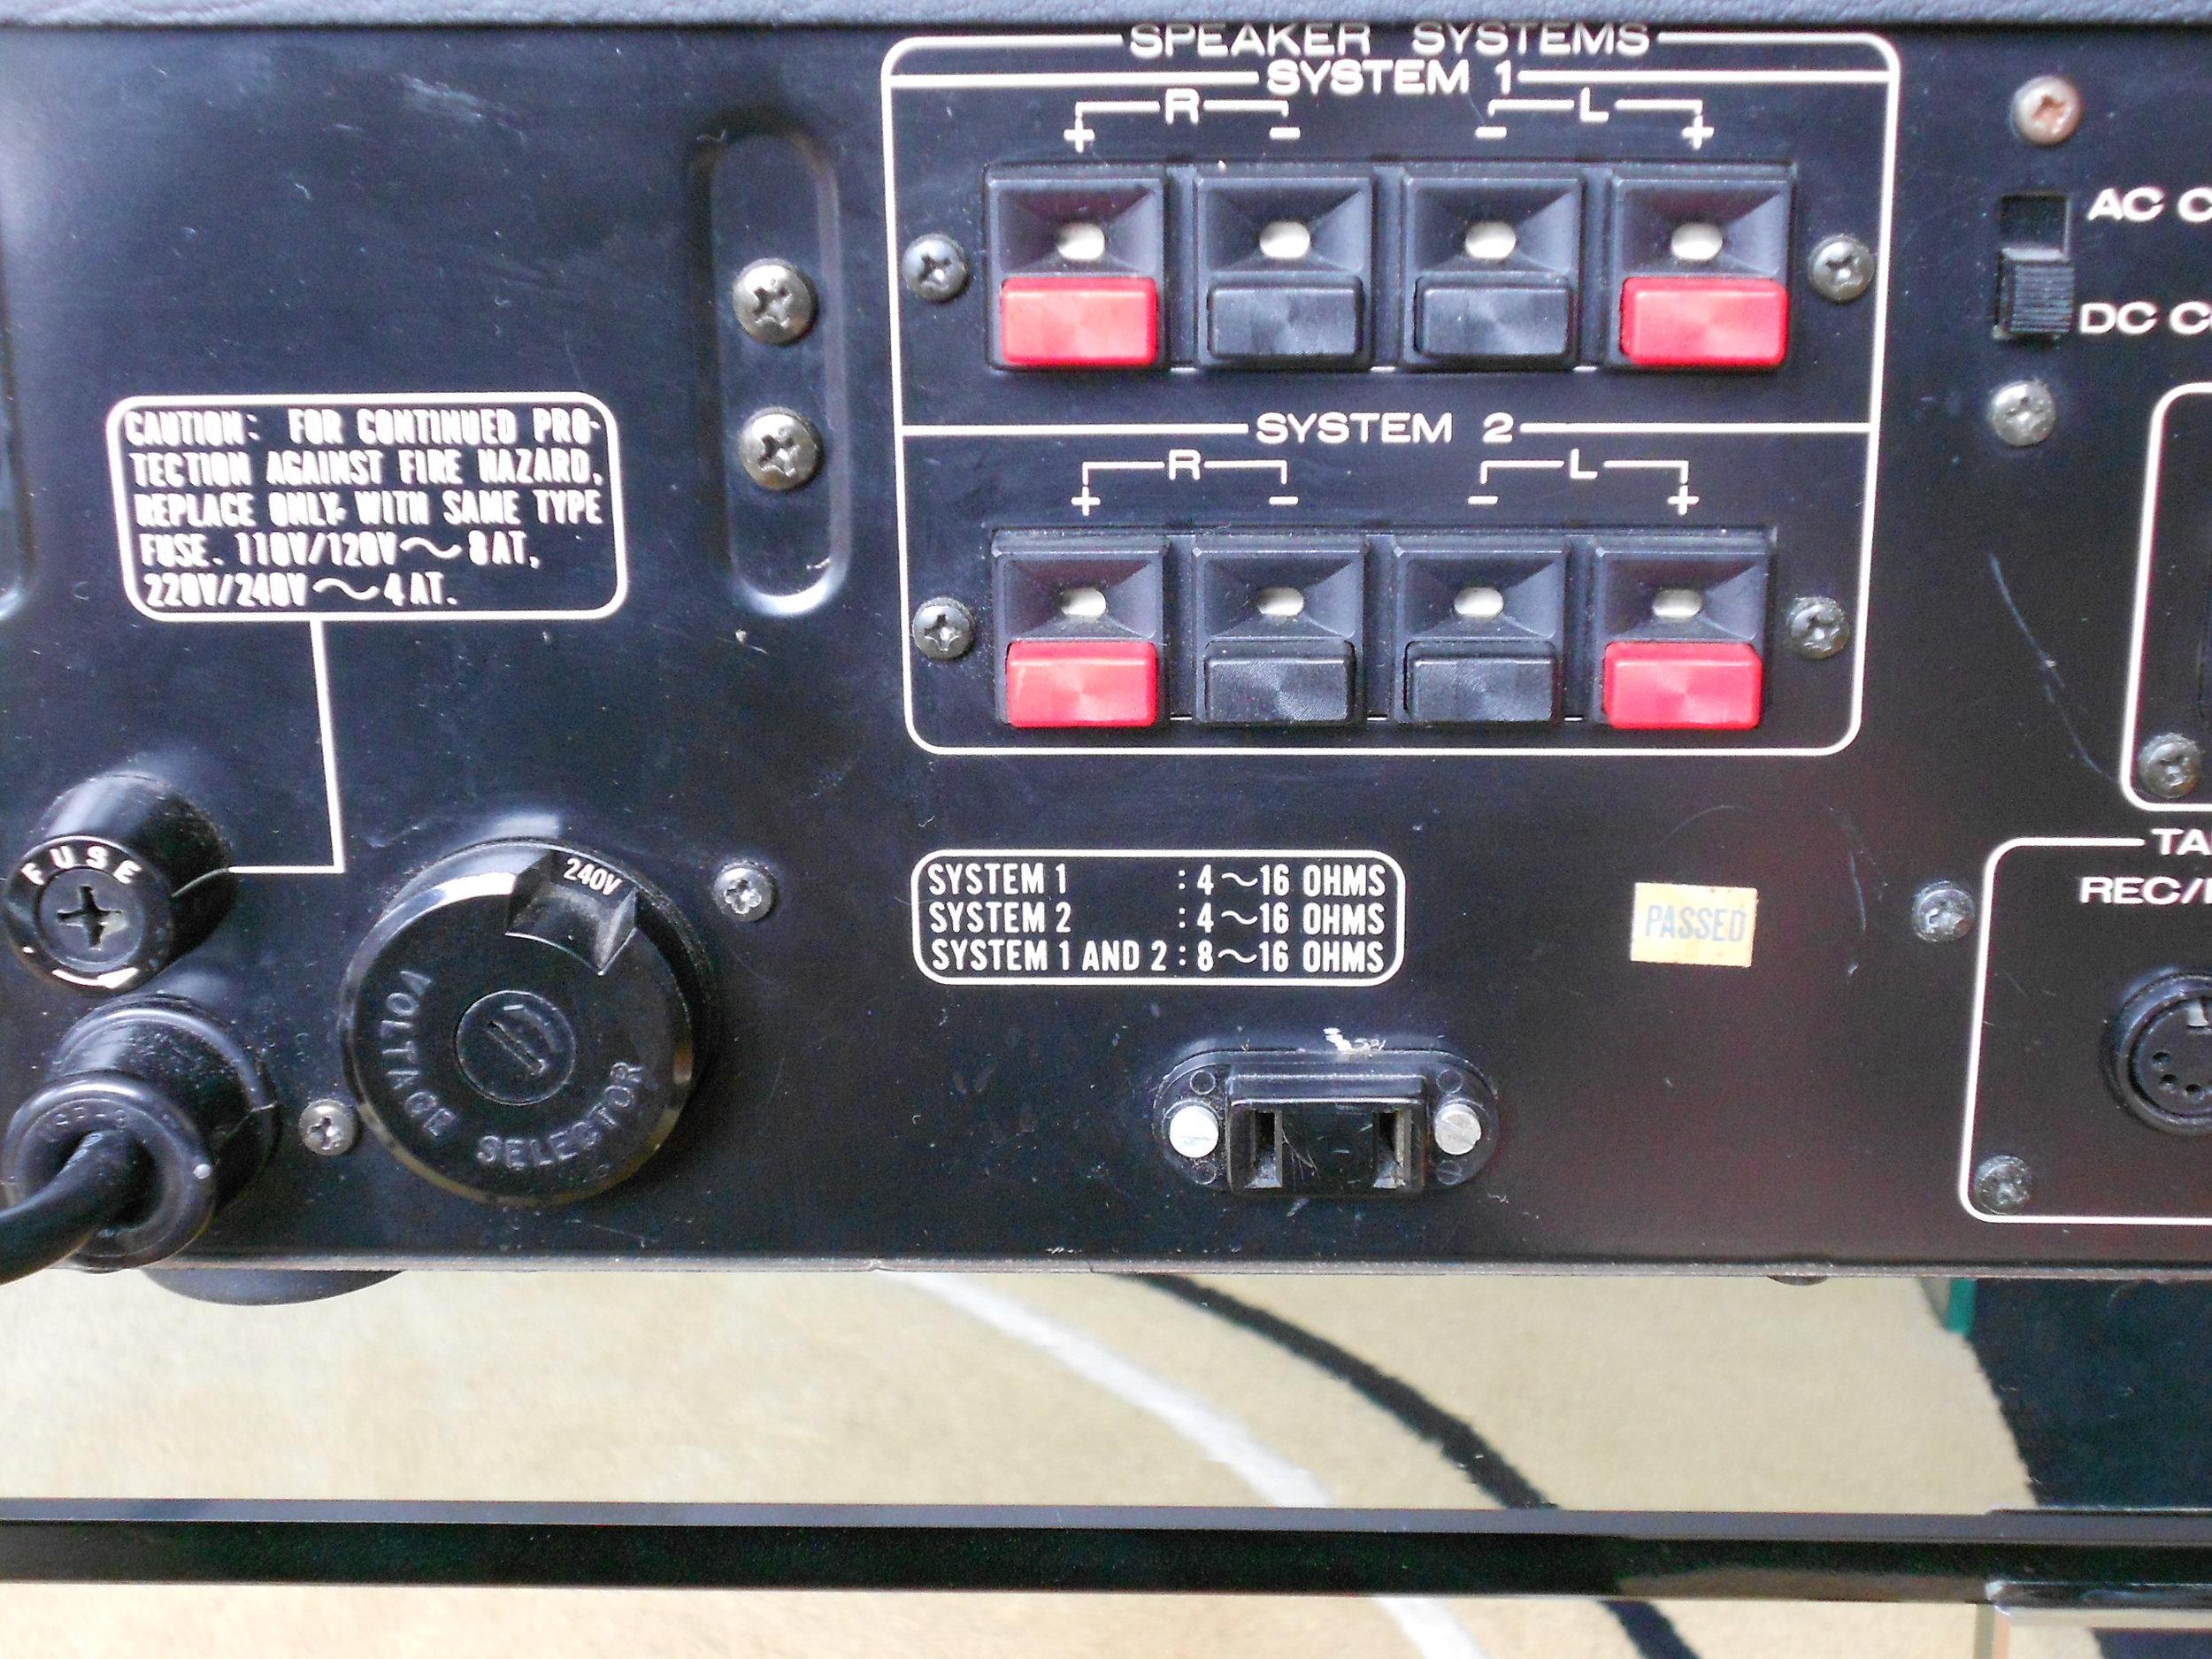 Marantz 1300DC integrated amplifier rear view.